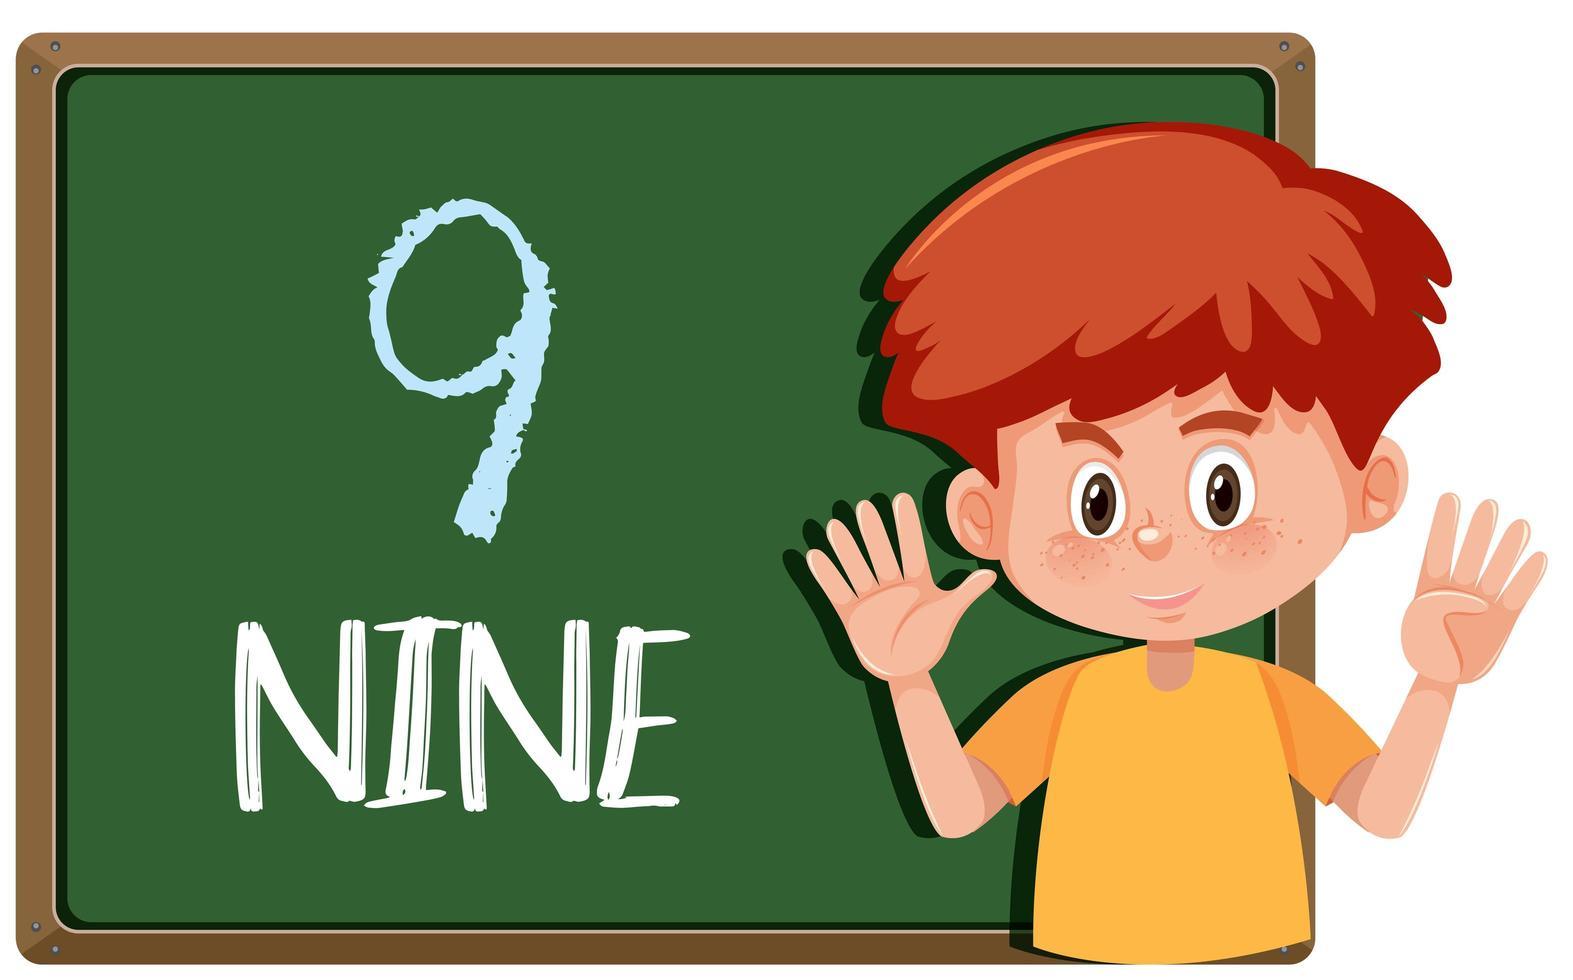 A boy with nine finger gesture